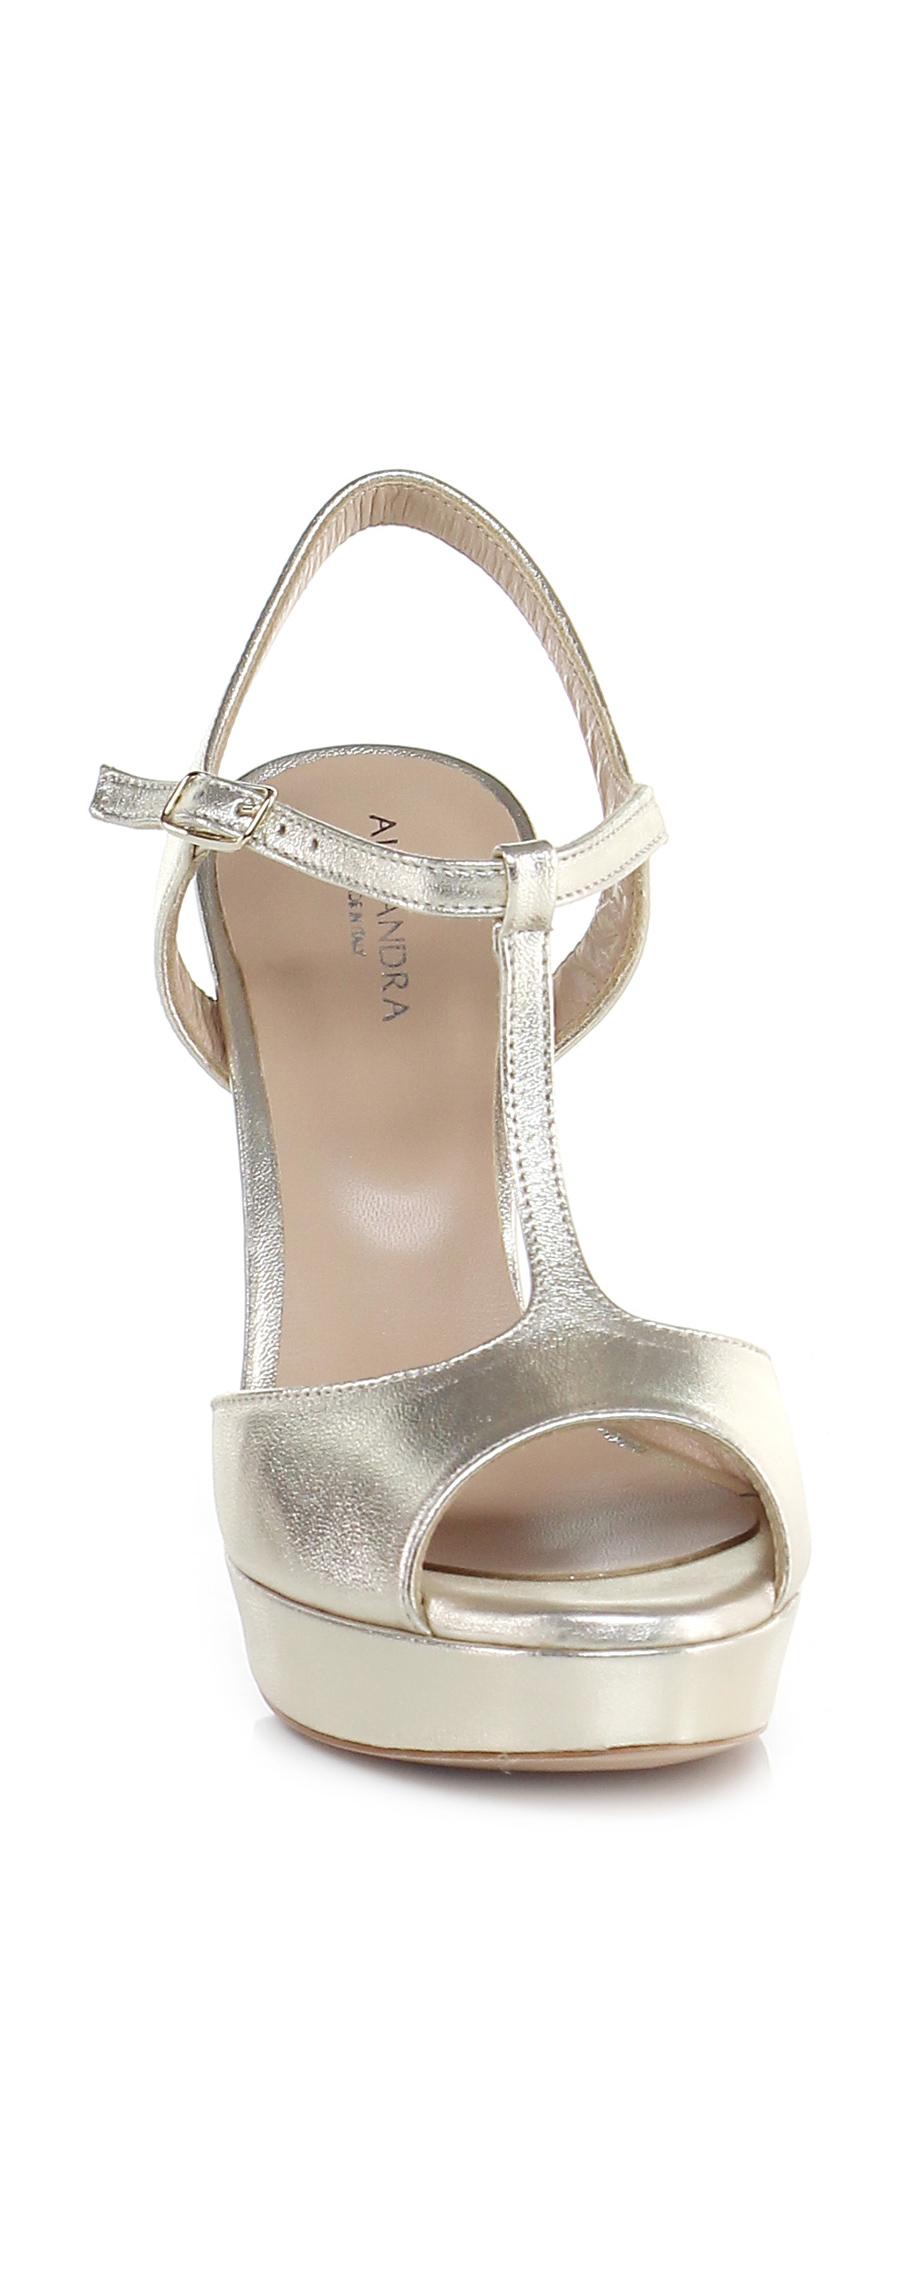 Sandalo alto alto Sandalo Platino Alexandra Verschleißfeste billige Schuhe 2424d9